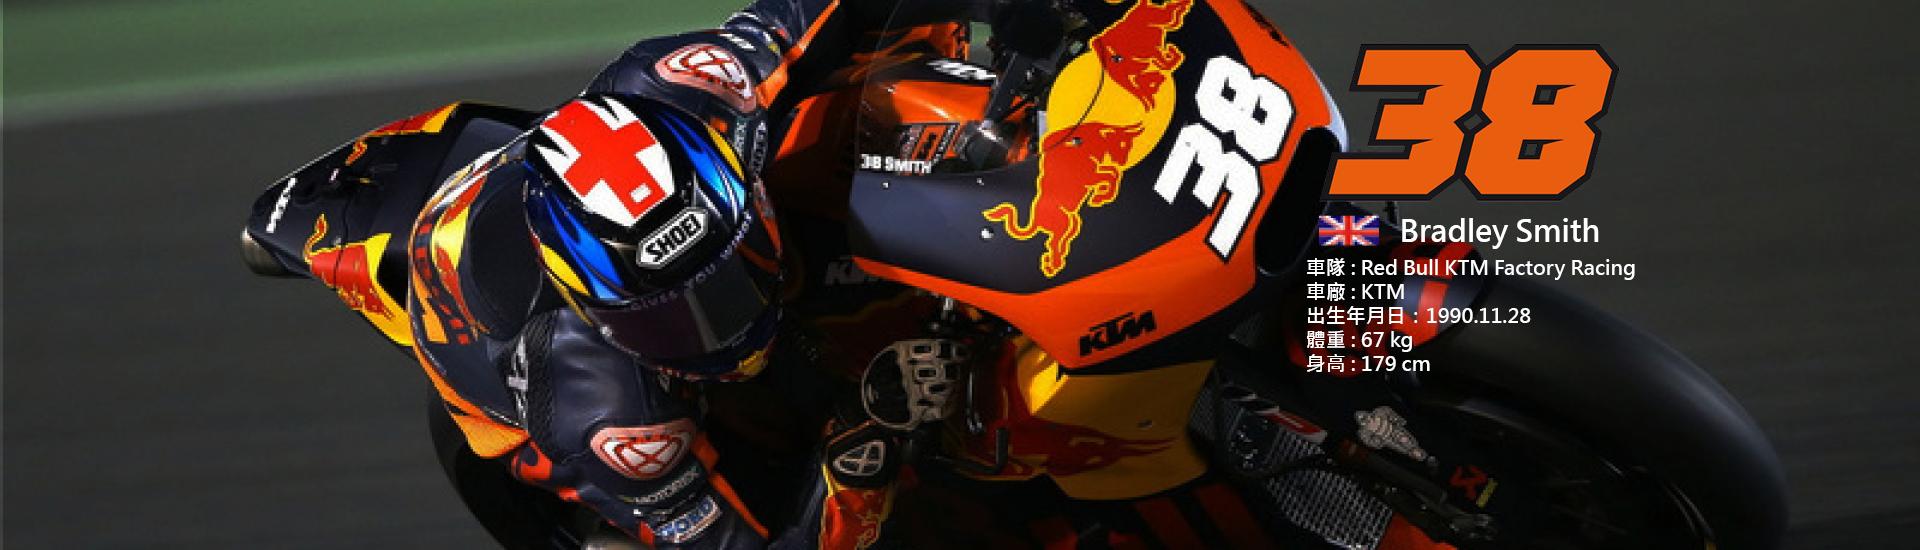 2018 MotoGP 【38】Bradley Smith